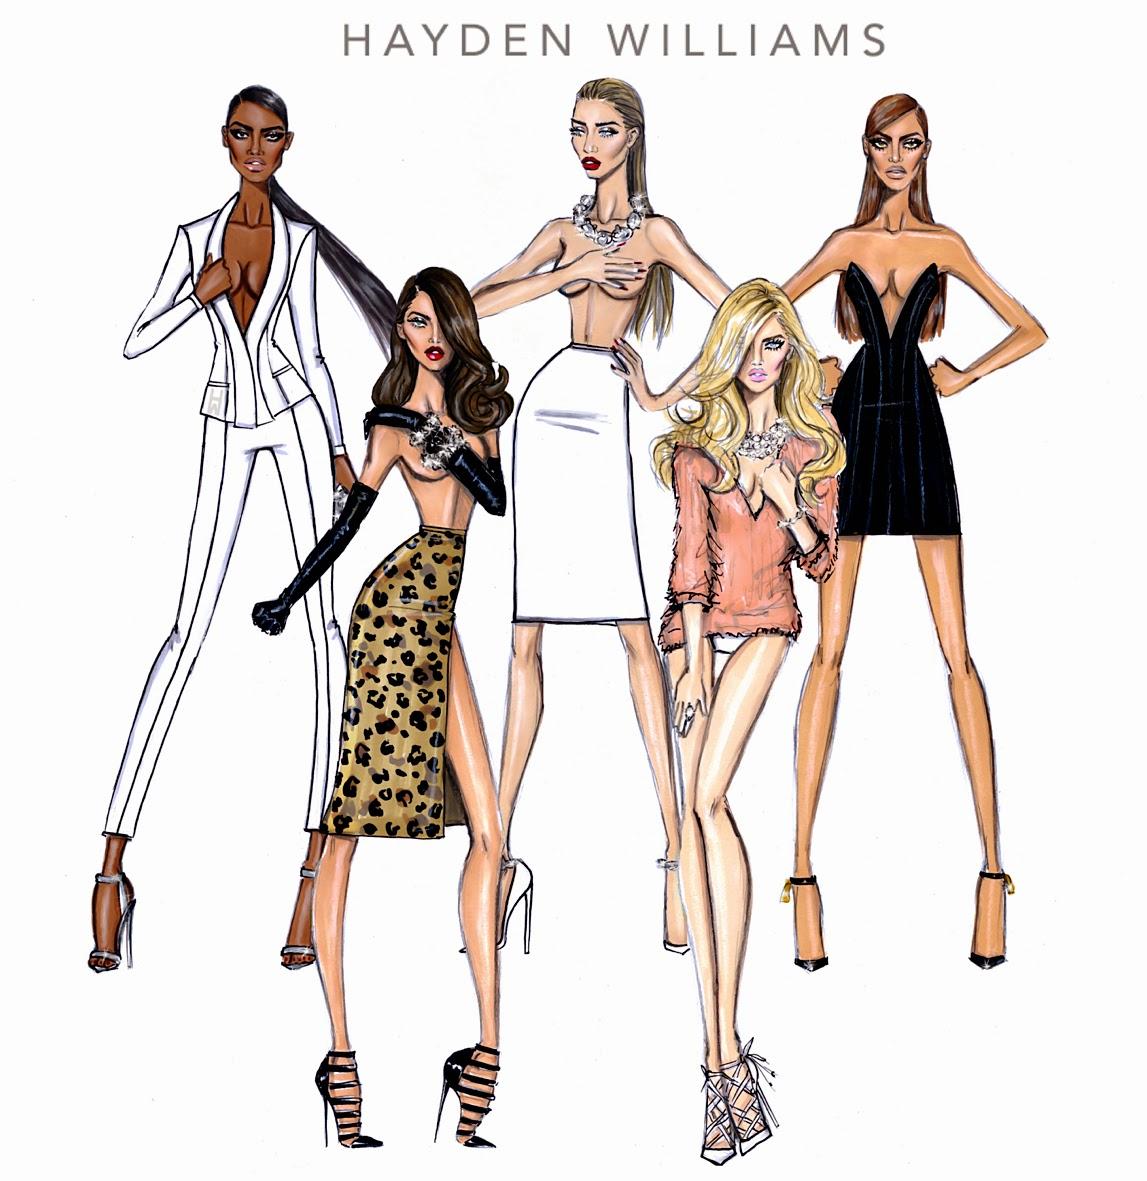 Zionology: Stunning Fashion Sketches By Hayden Williams